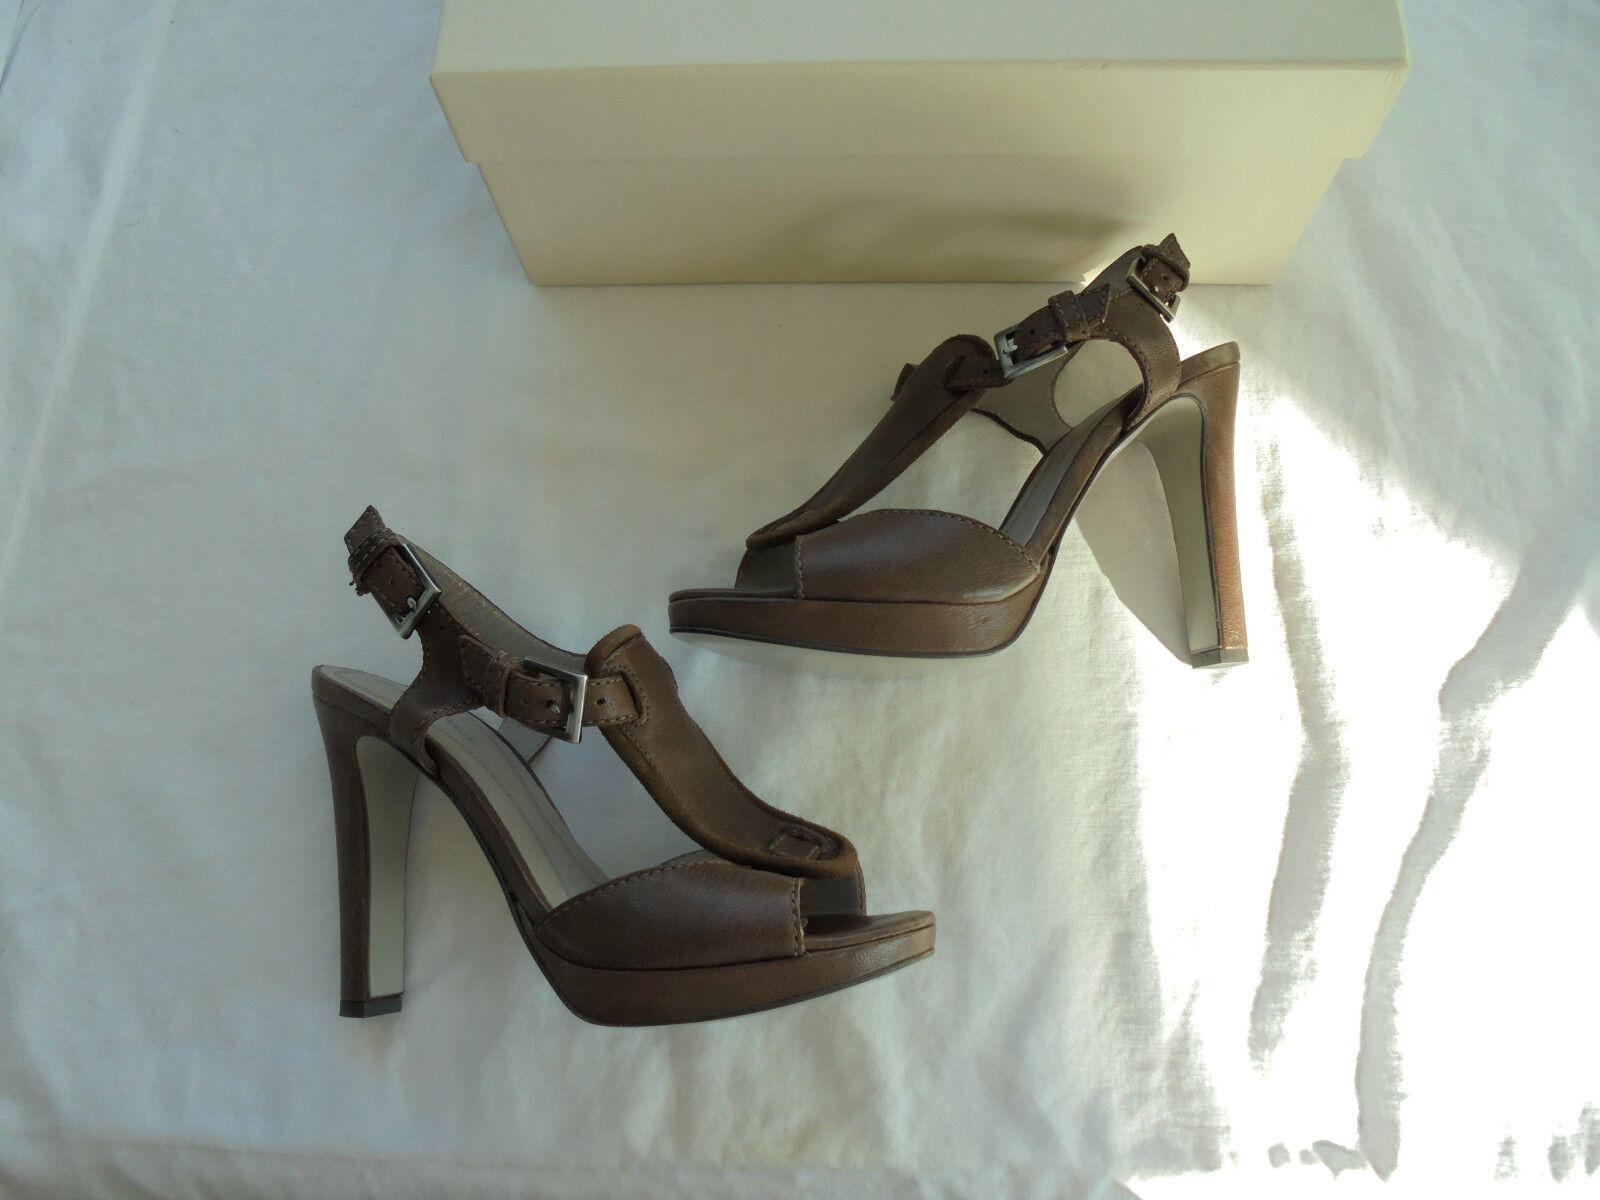 NEU Hugo Boss Leder High Heels Sandaletten NP:  + OVP Sandaletten Heels Pumps Schuhe Gr. 37 c8ea85